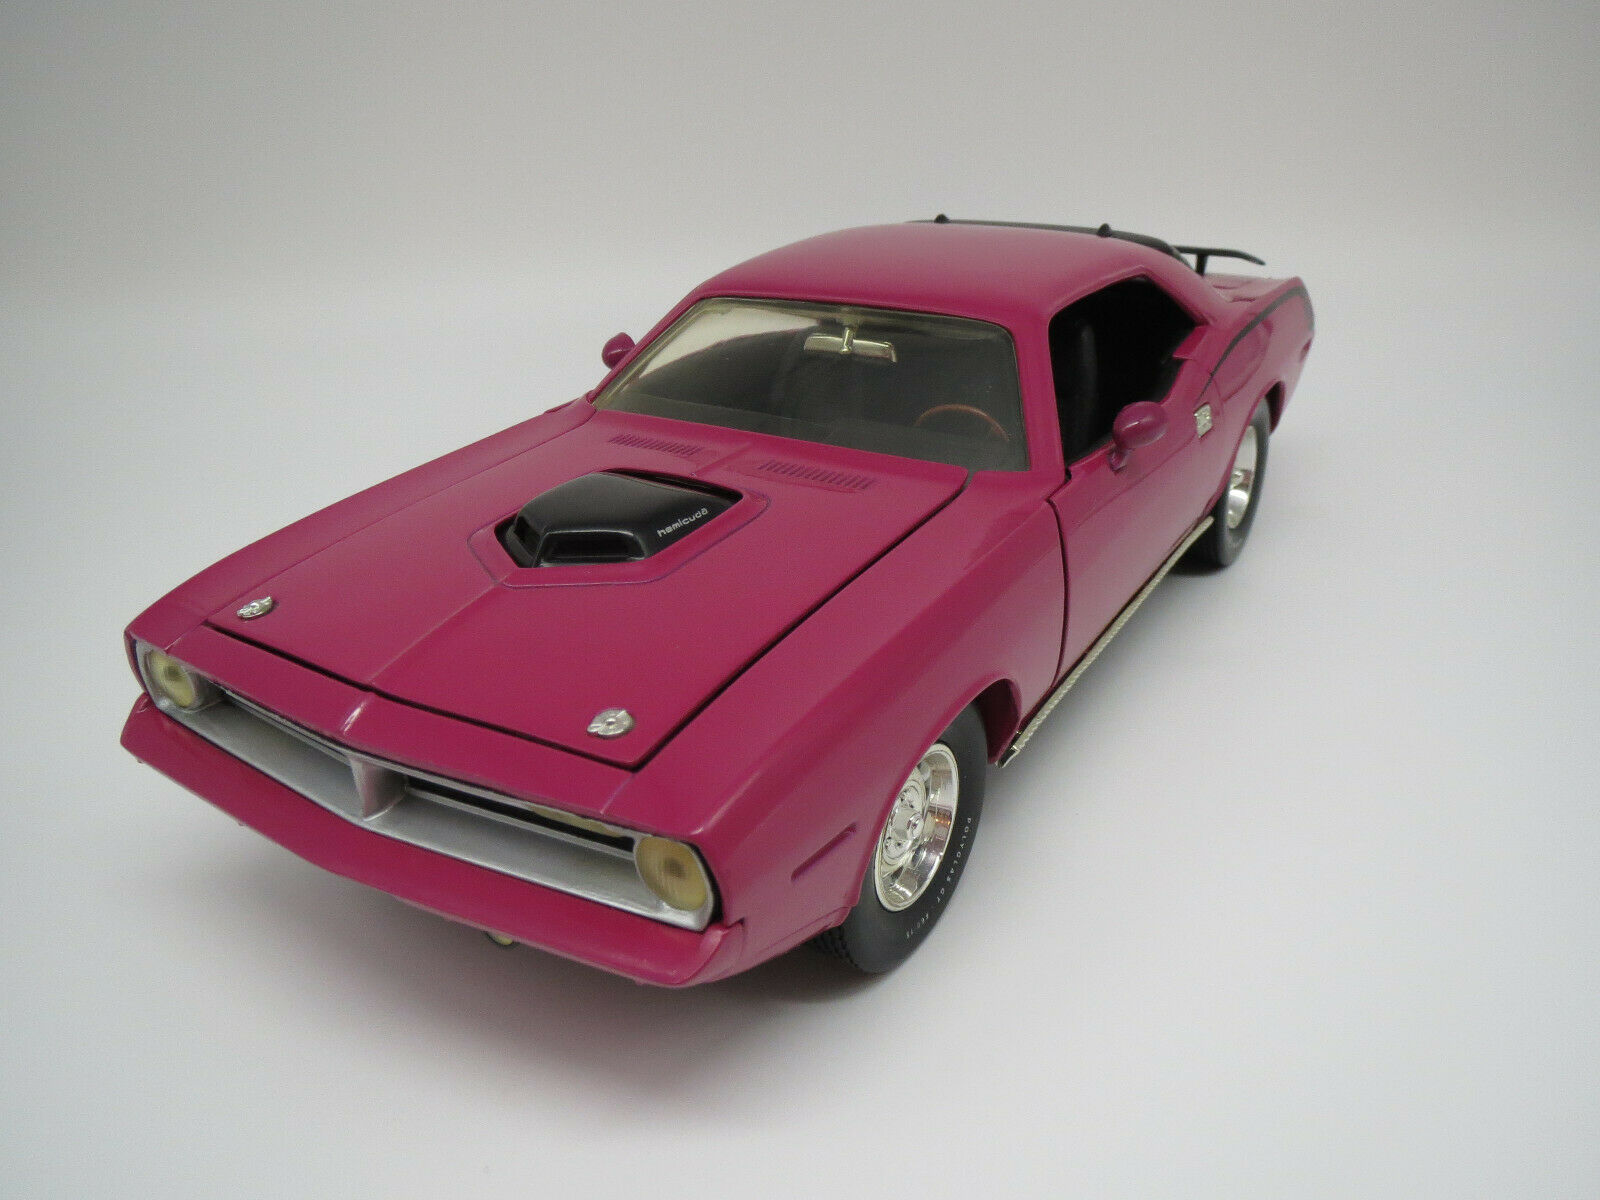 Ertl American Muscle  Plymouth  Hemi  Cuda   1970  (pink)  1 18 ohne Vp.